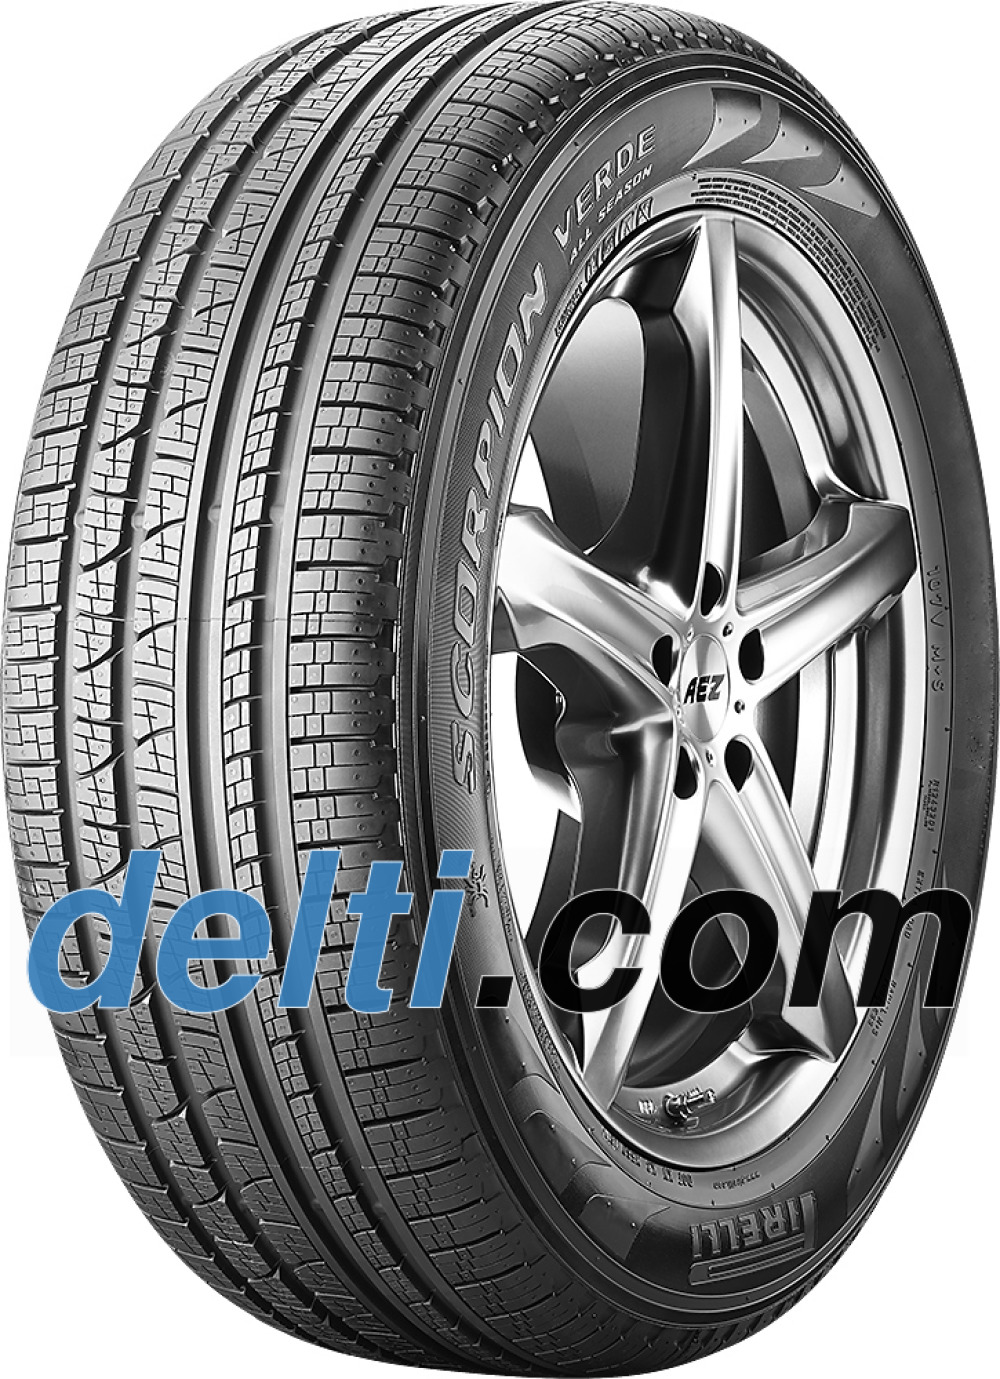 Pirelli Scorpion Verde All-Season ( 275/40 R21 107V XL ECOIMPACT, with rim protection ridge (FSL) )